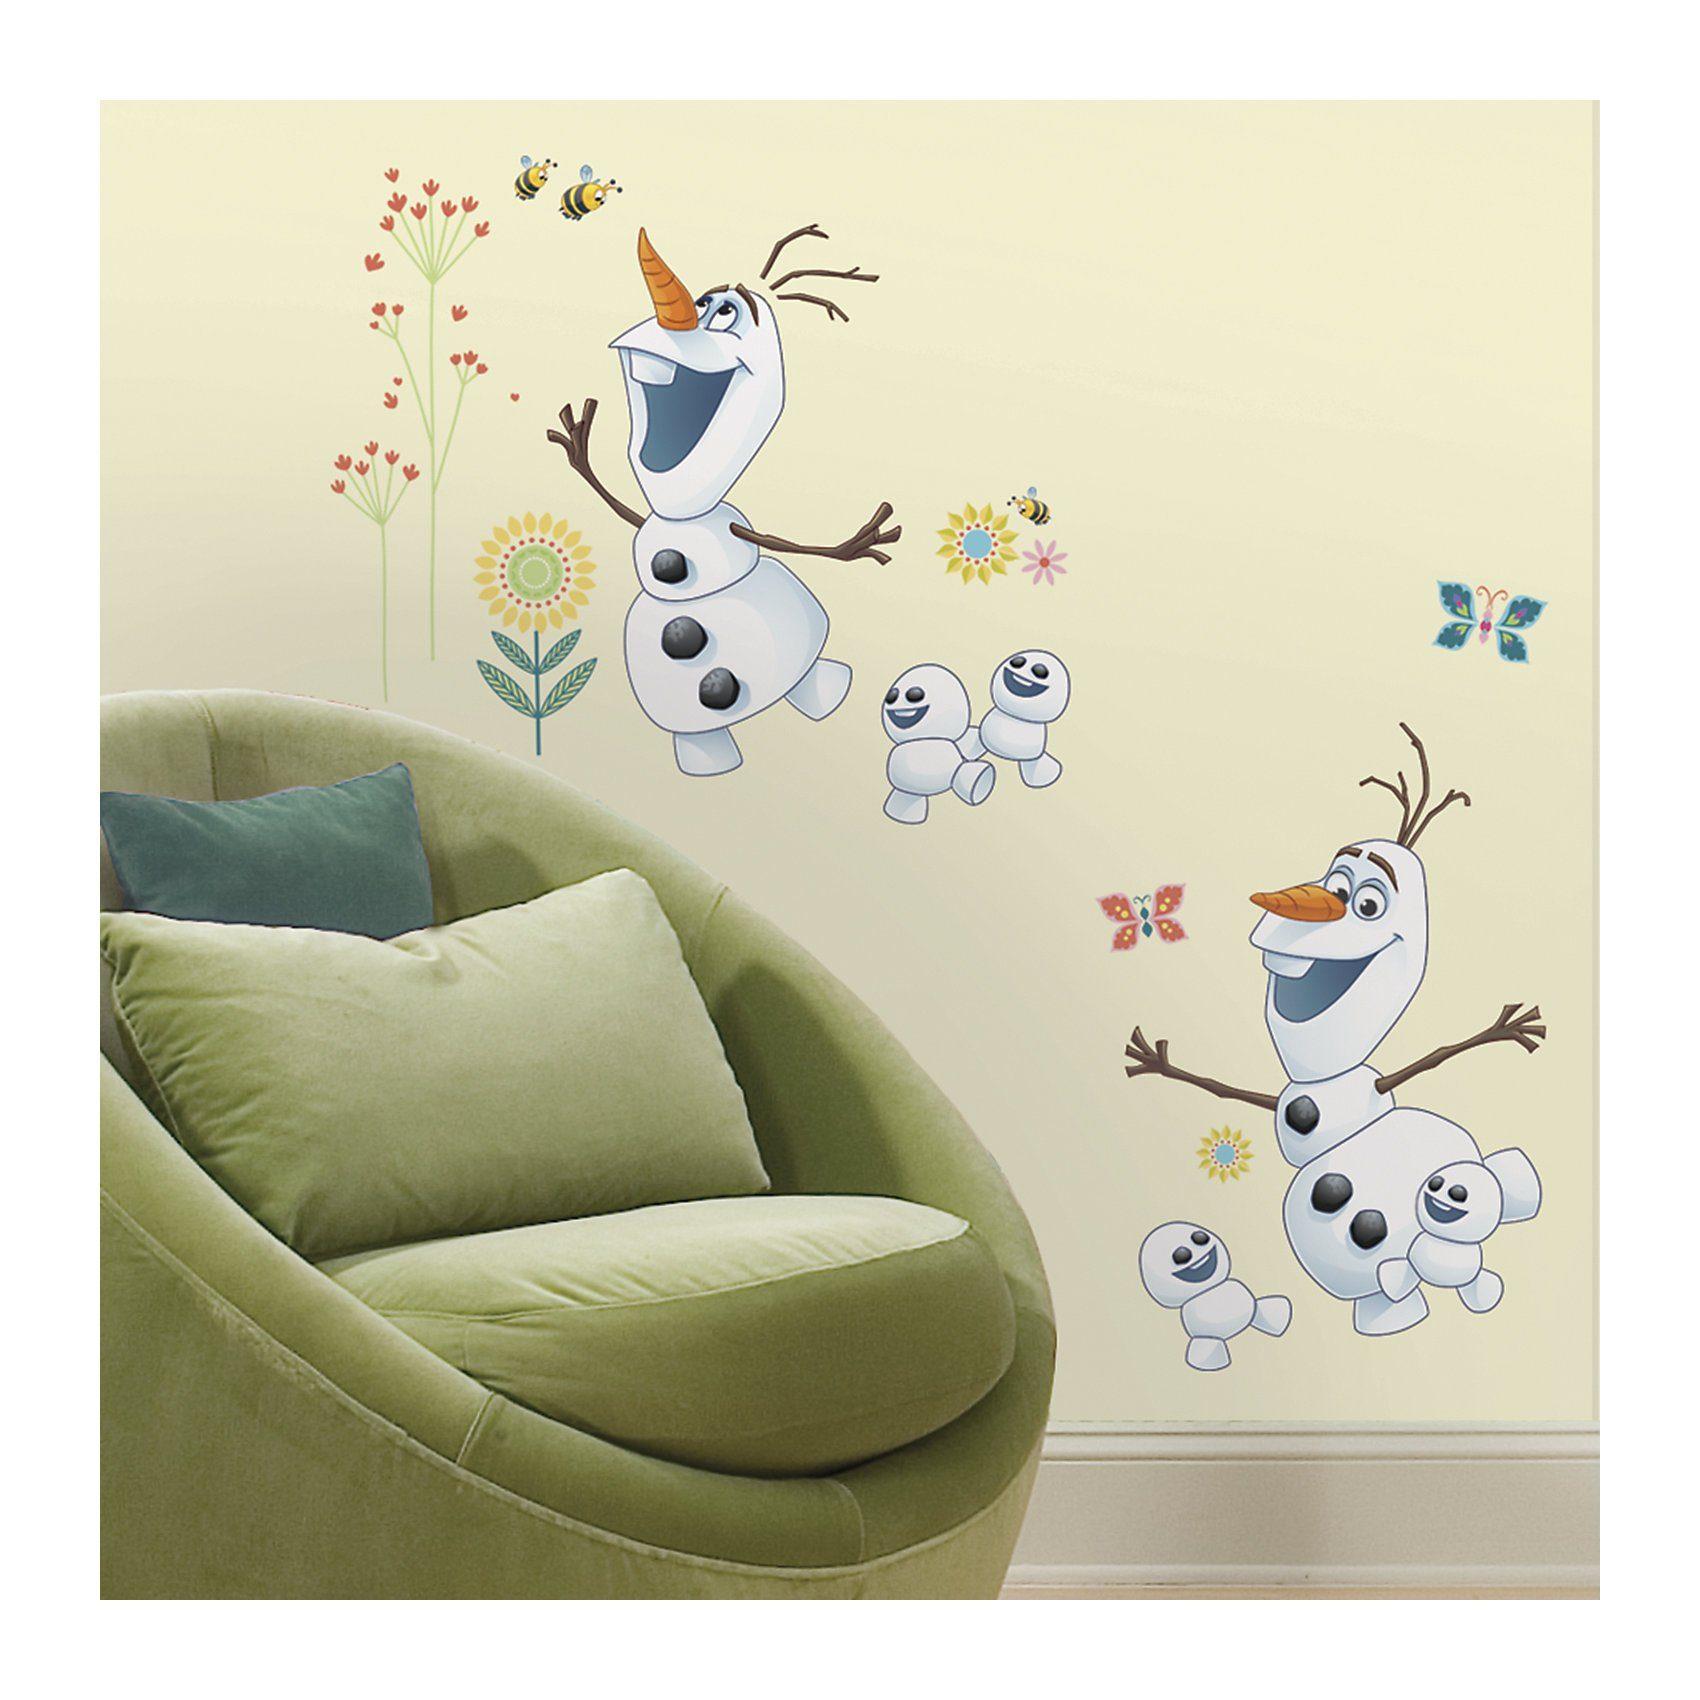 RoomMates Wandsticker Disney Die Eiskönigin, Olaf, 26-tlg.